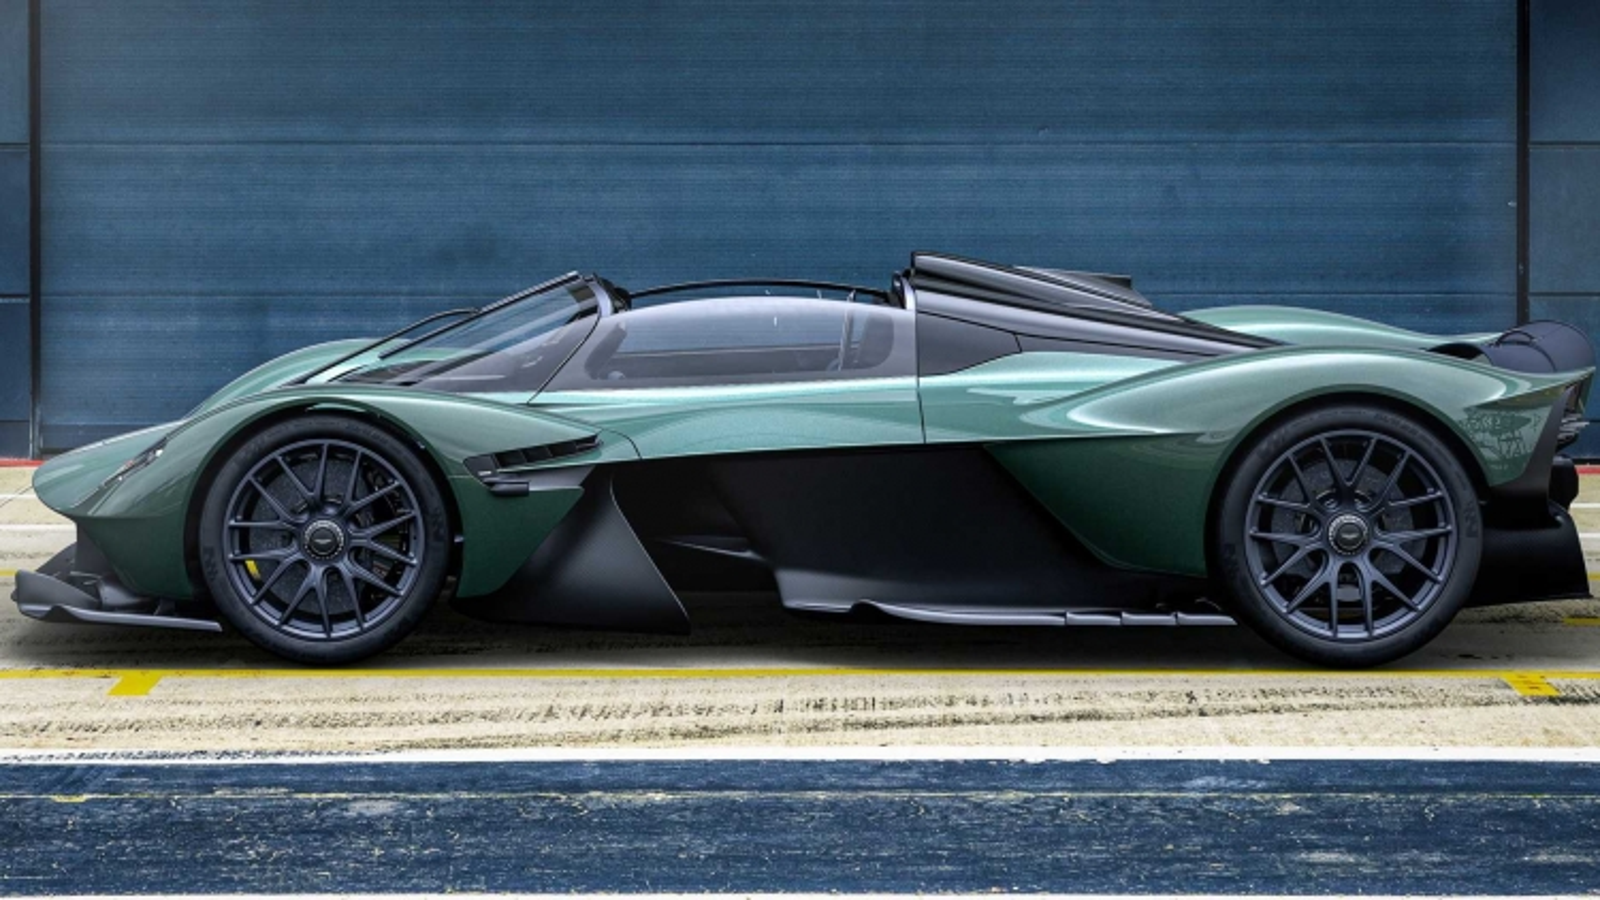 Aston Martin ra mắt siêu phẩm mui trần Valkyrie Spider